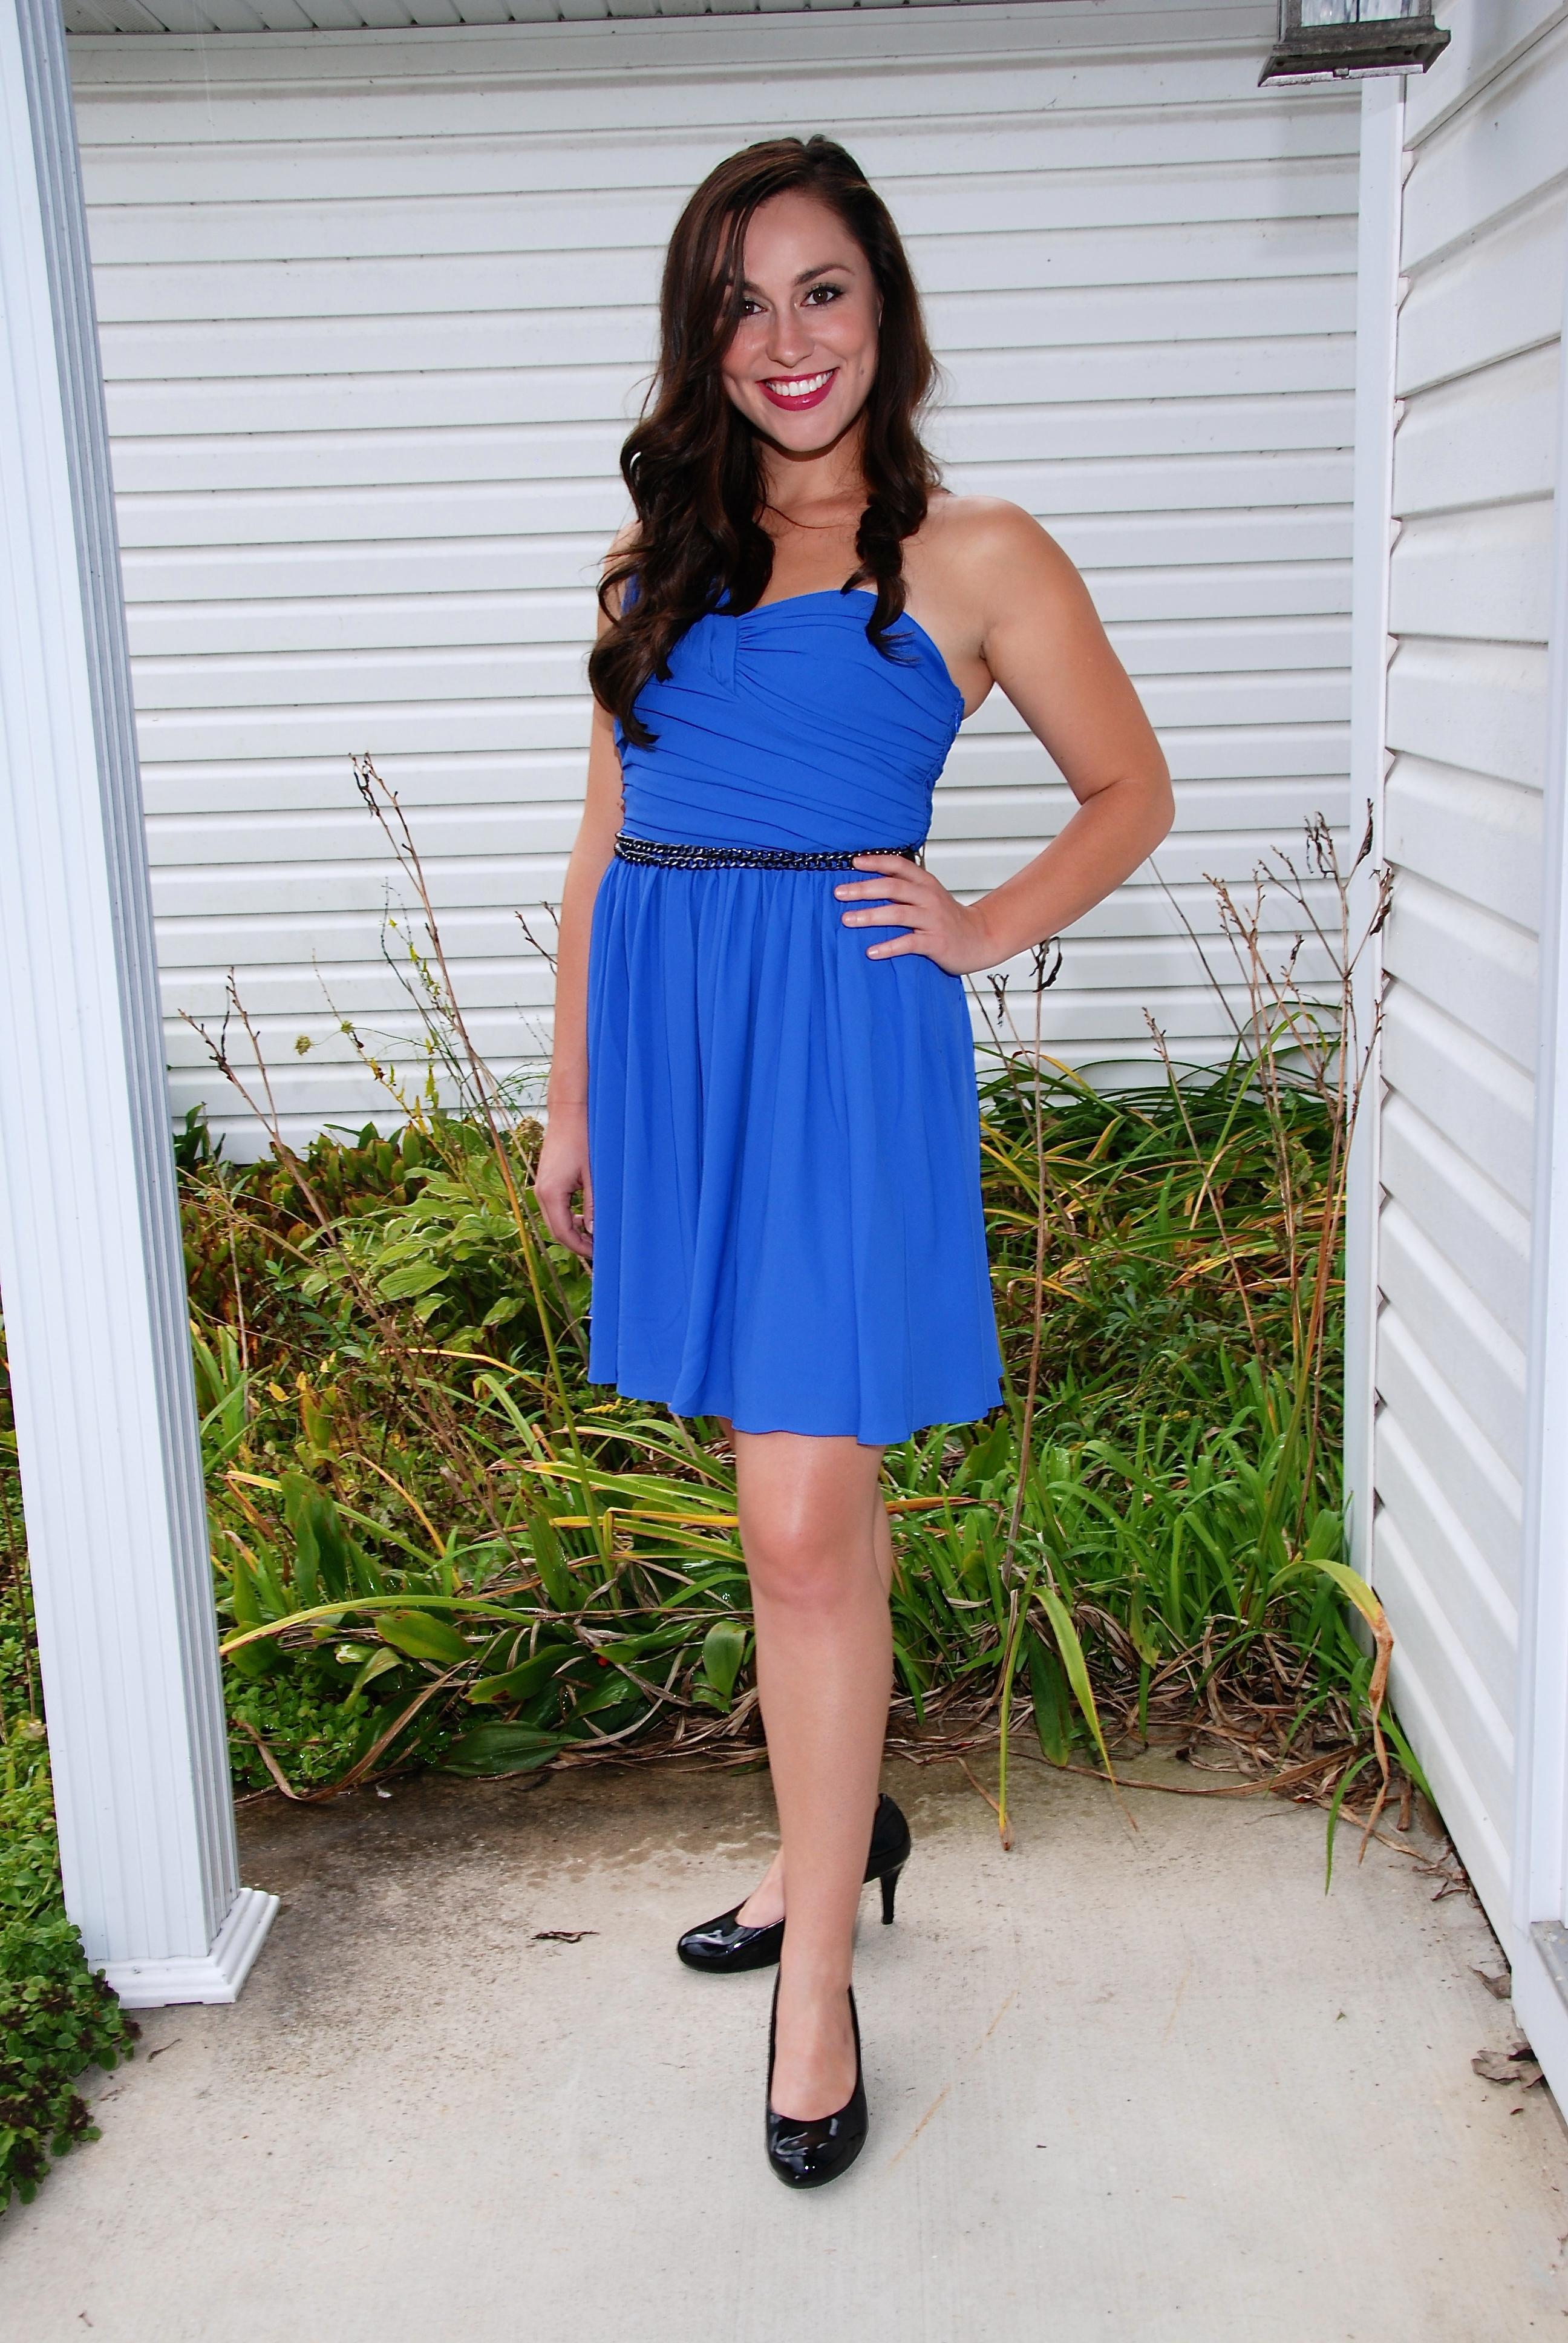 photo of ENVE Model Danielle